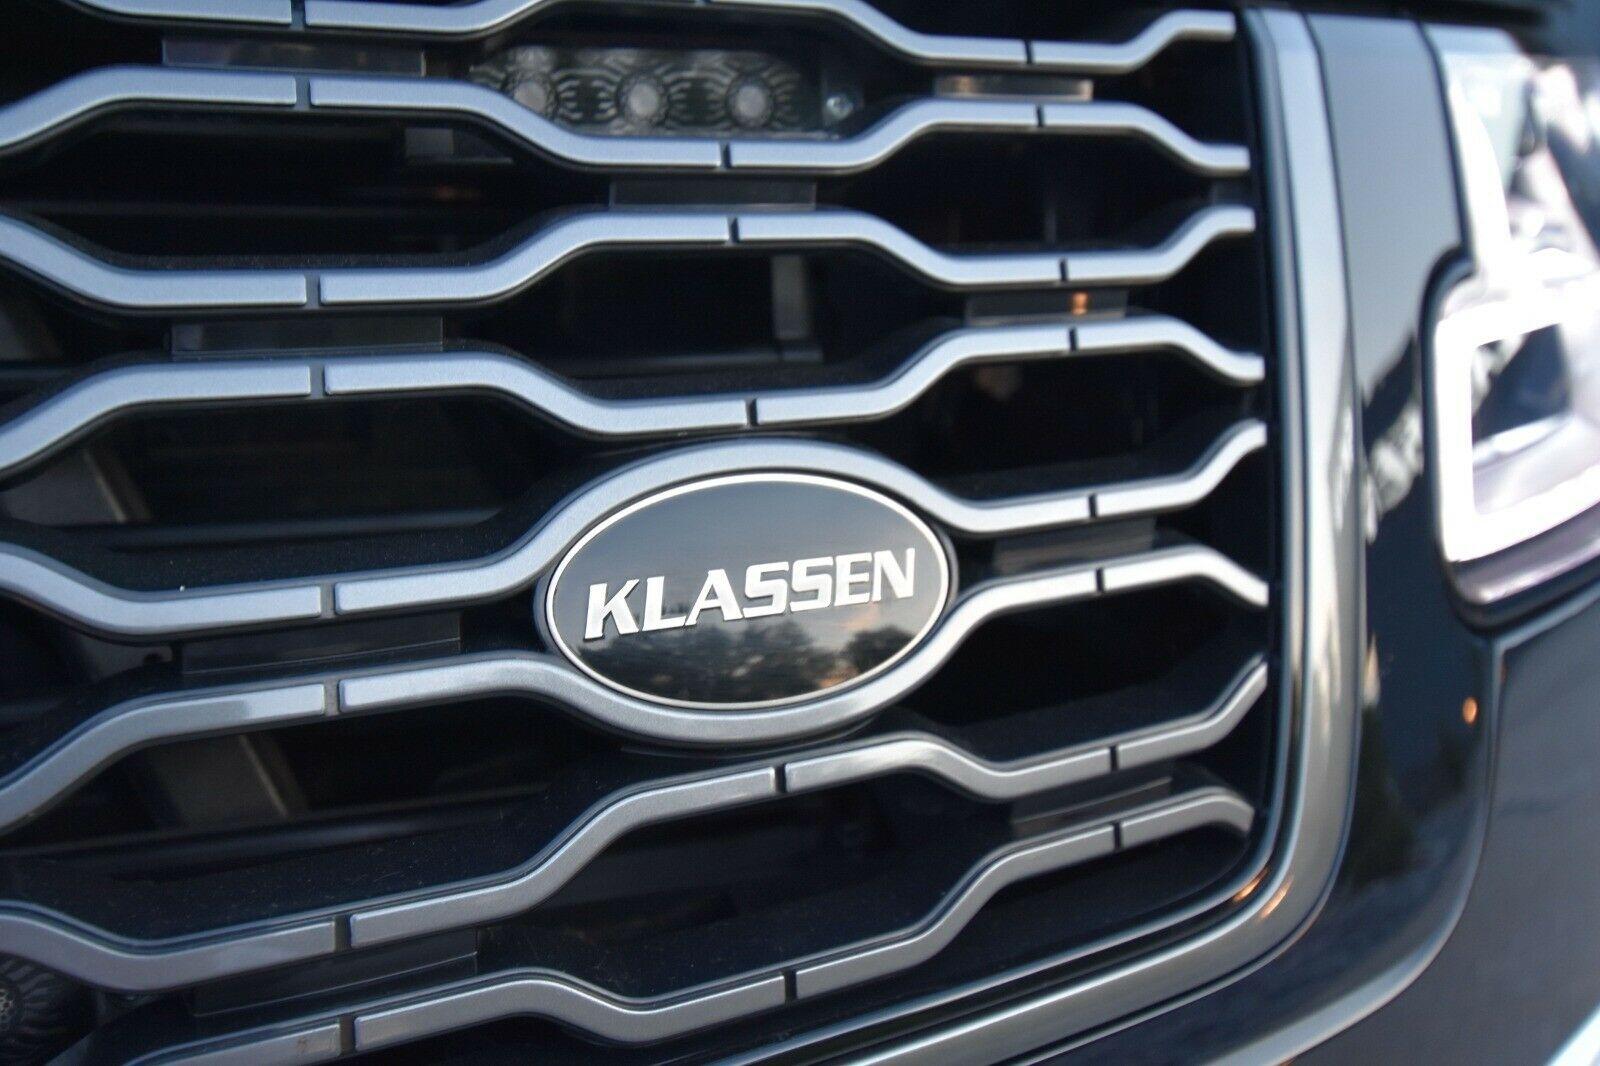 Range-Rover-SVAutobiography-by-Klassen-13